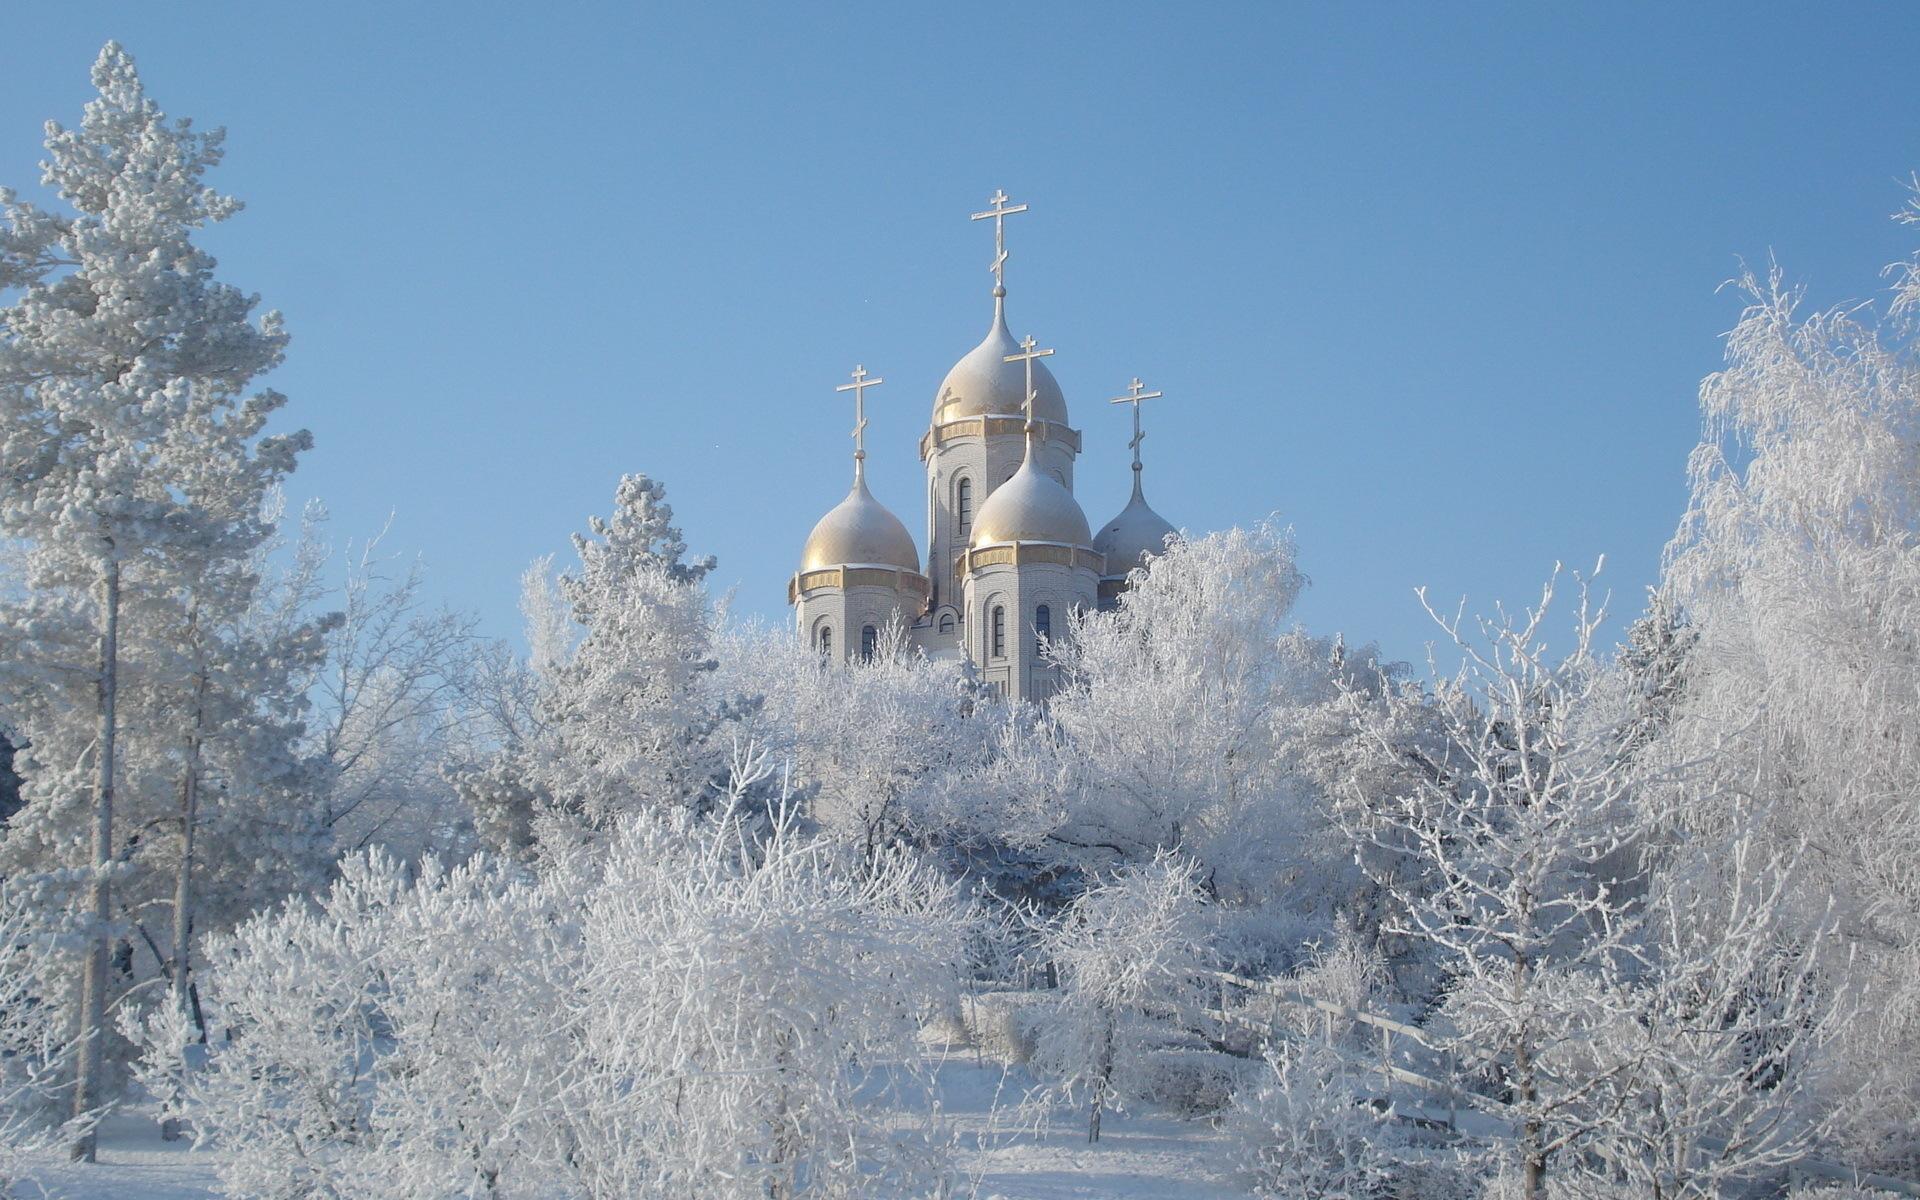 Новому году, картинки обои фото мороз зима крещение